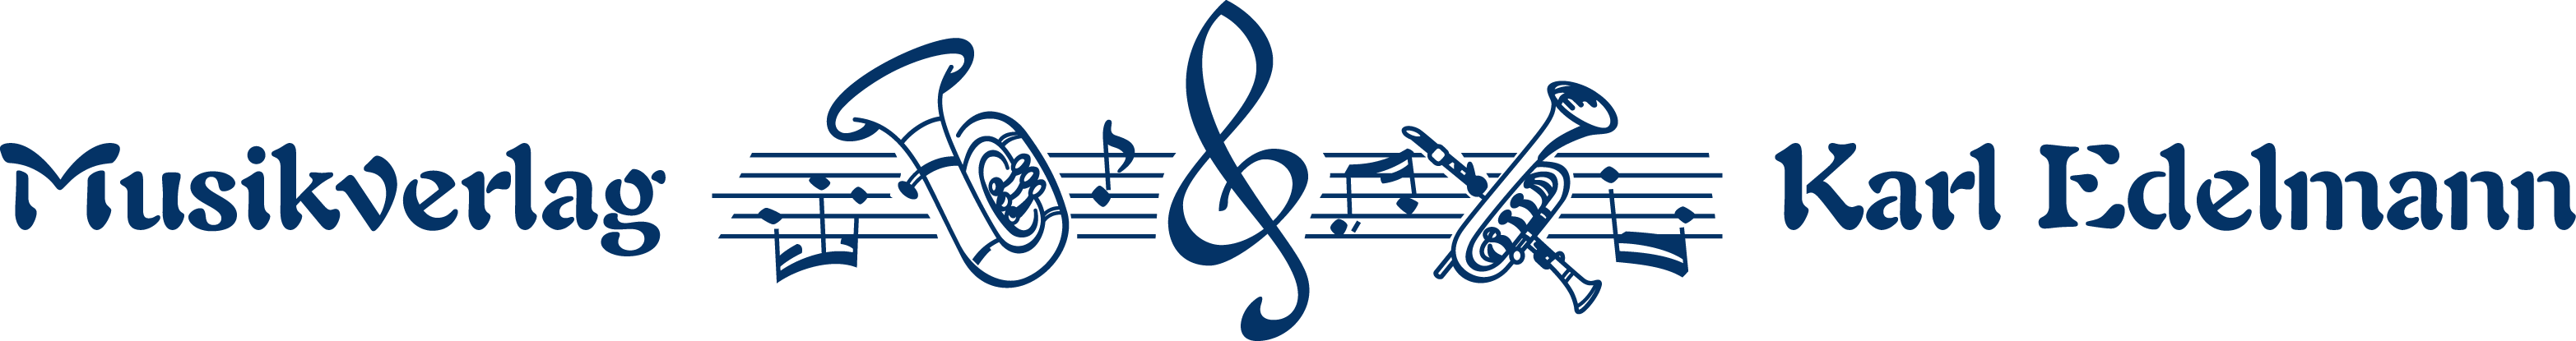 www.musikverlag-edelmann.de-Logo